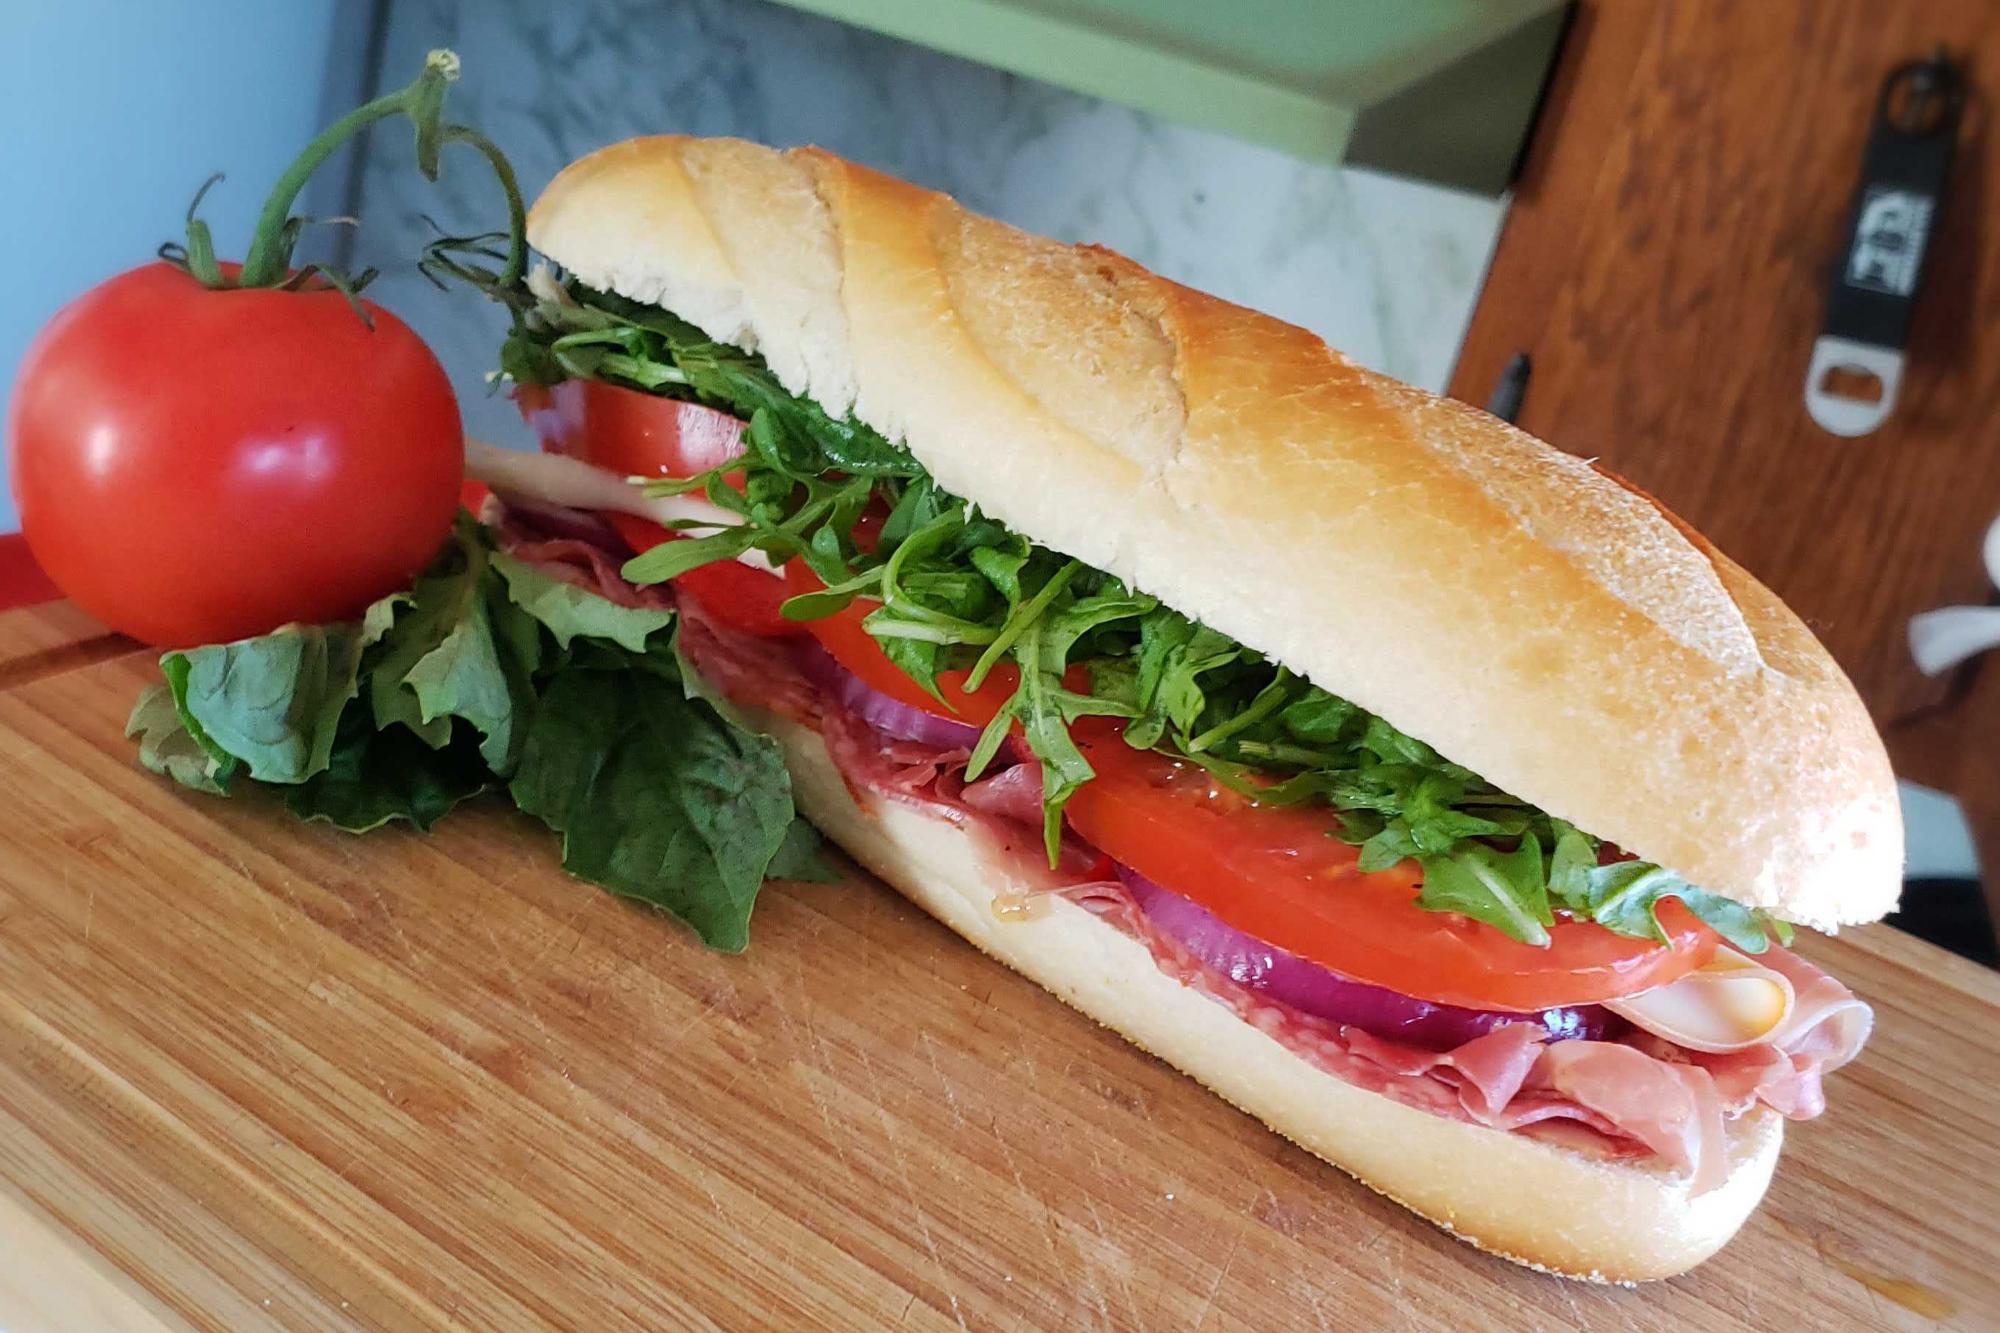 Close up of Super Italian Sub on cutting board with full tomato